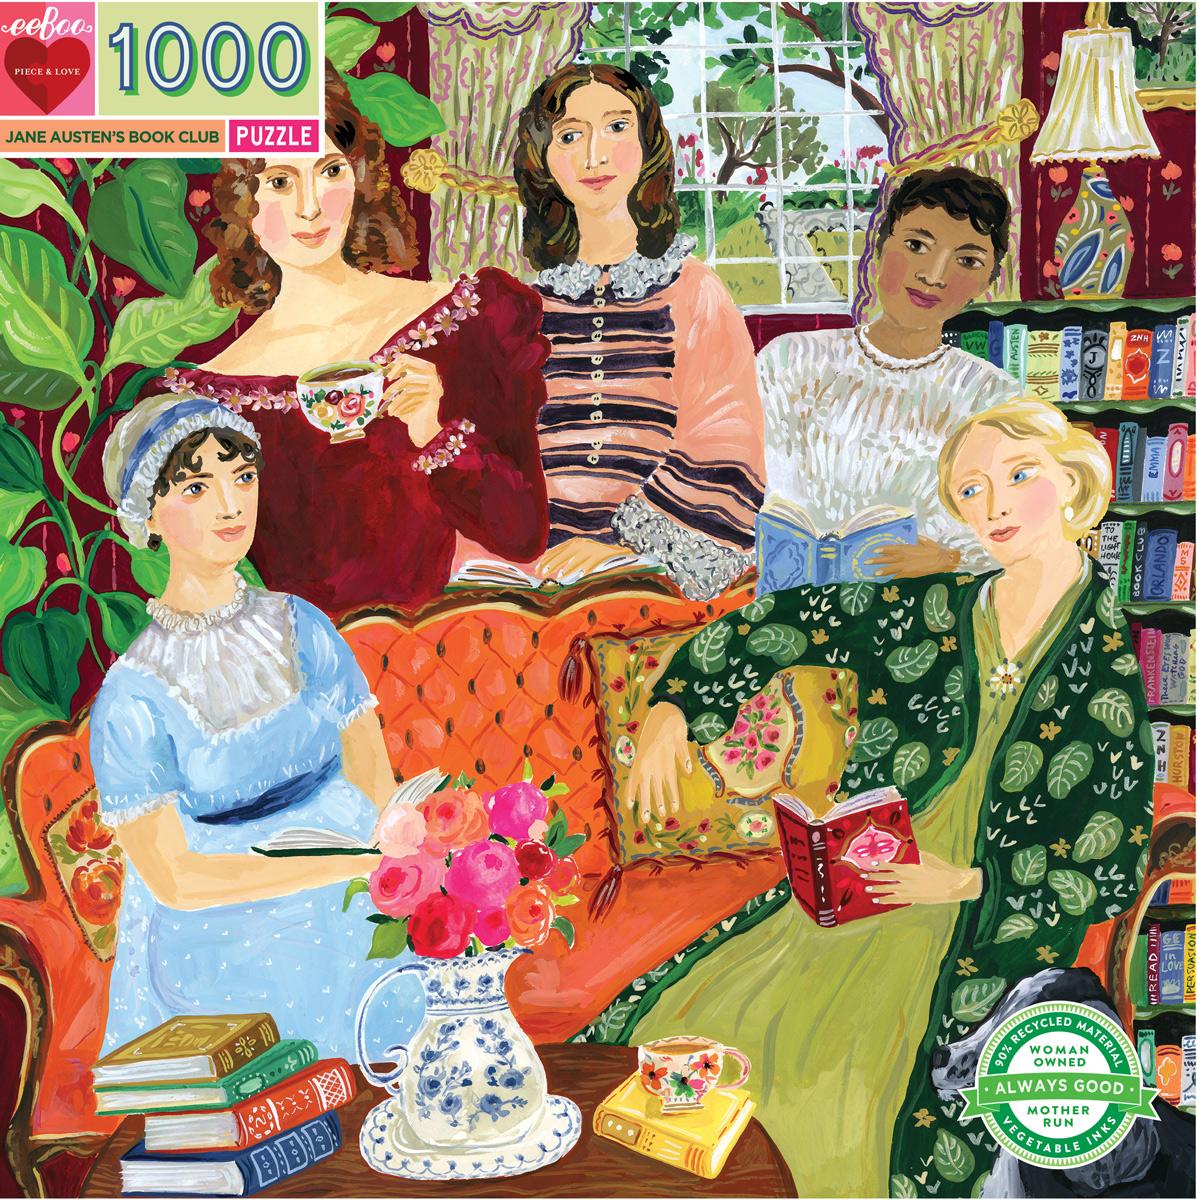 Jane Austen's Book Club People Jigsaw Puzzle